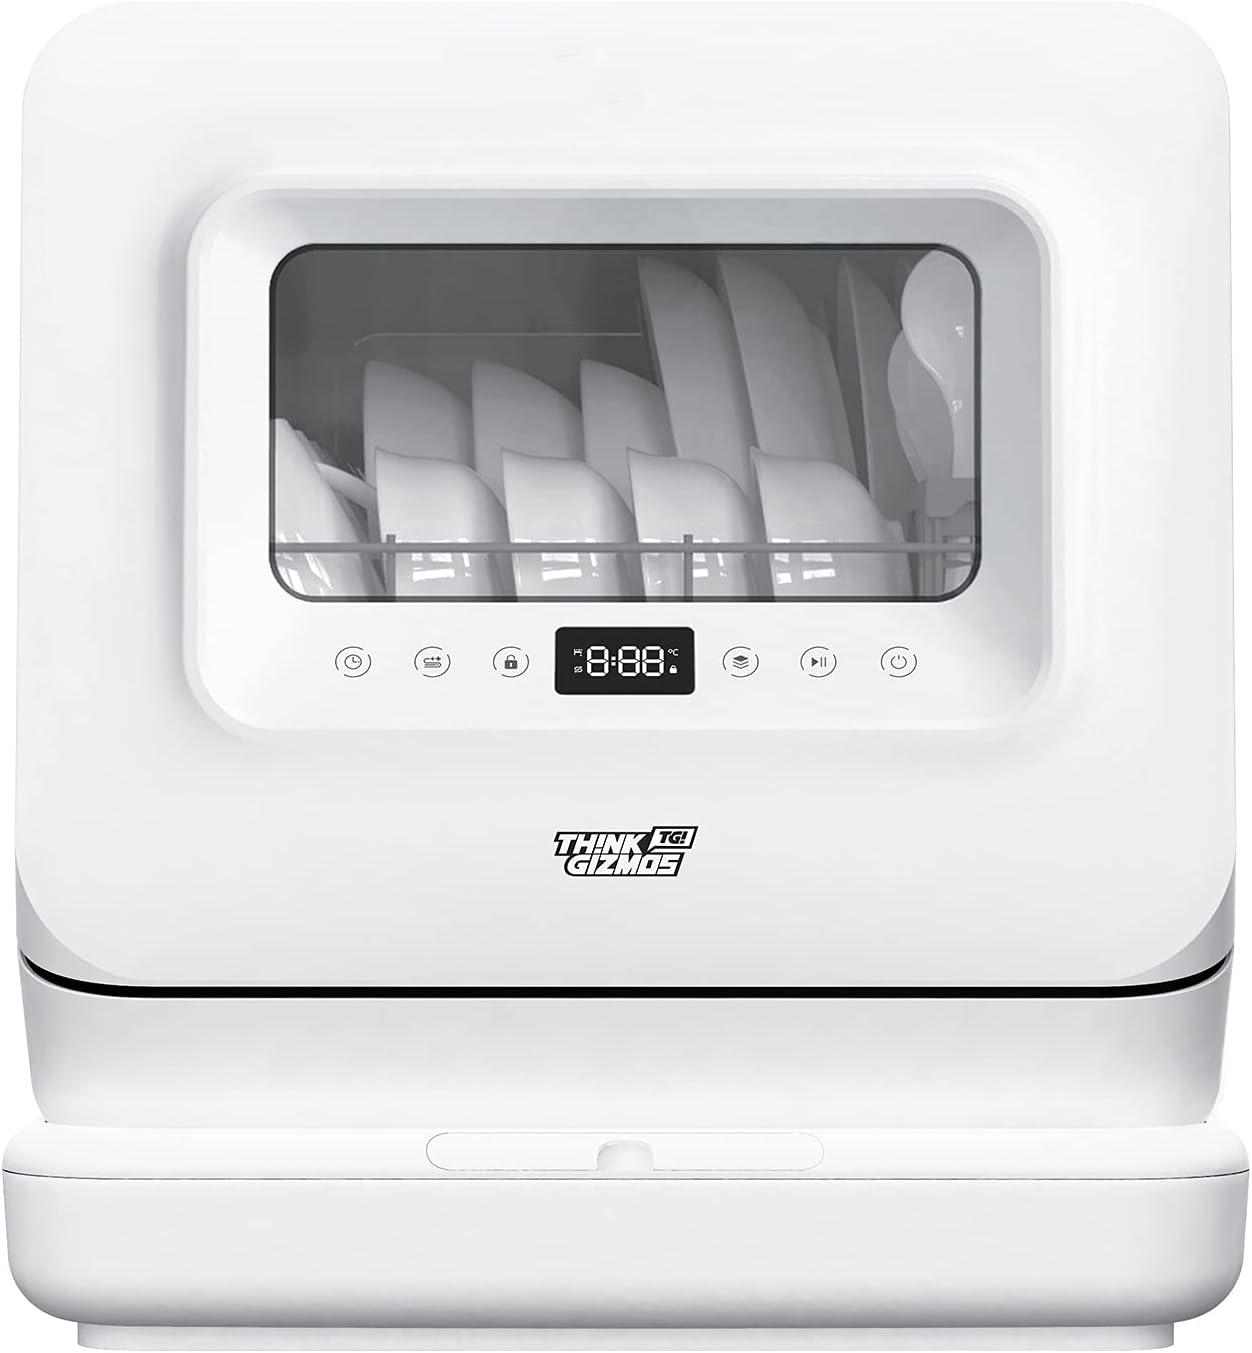 Think Gizmos Portable Countertop Dishwasher